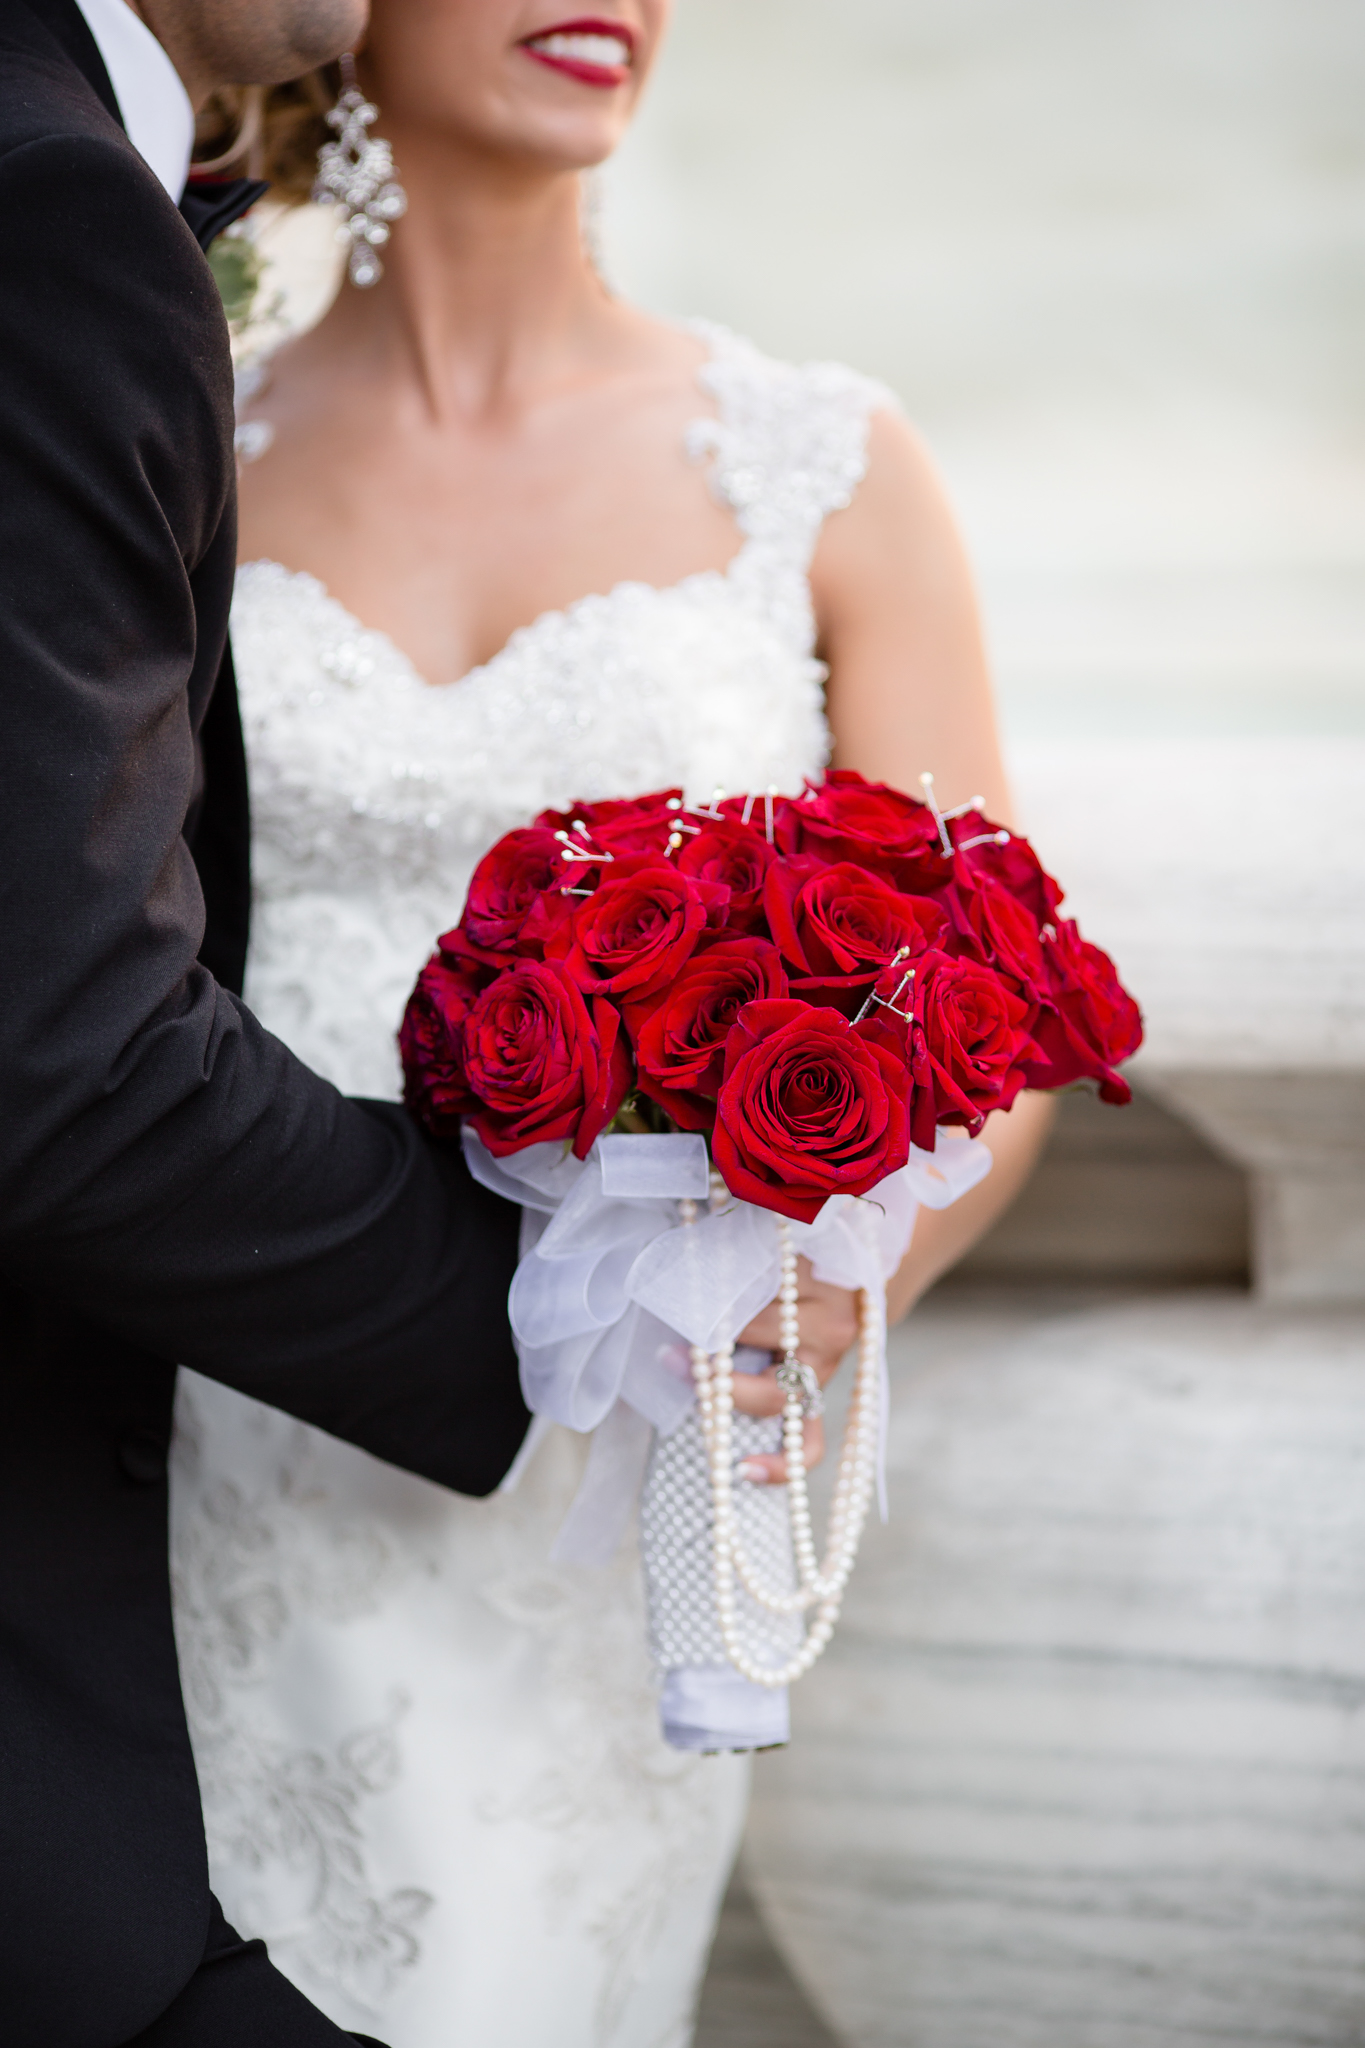 Statler-City-Buffalo-wedding-photographer- 0453.jpg